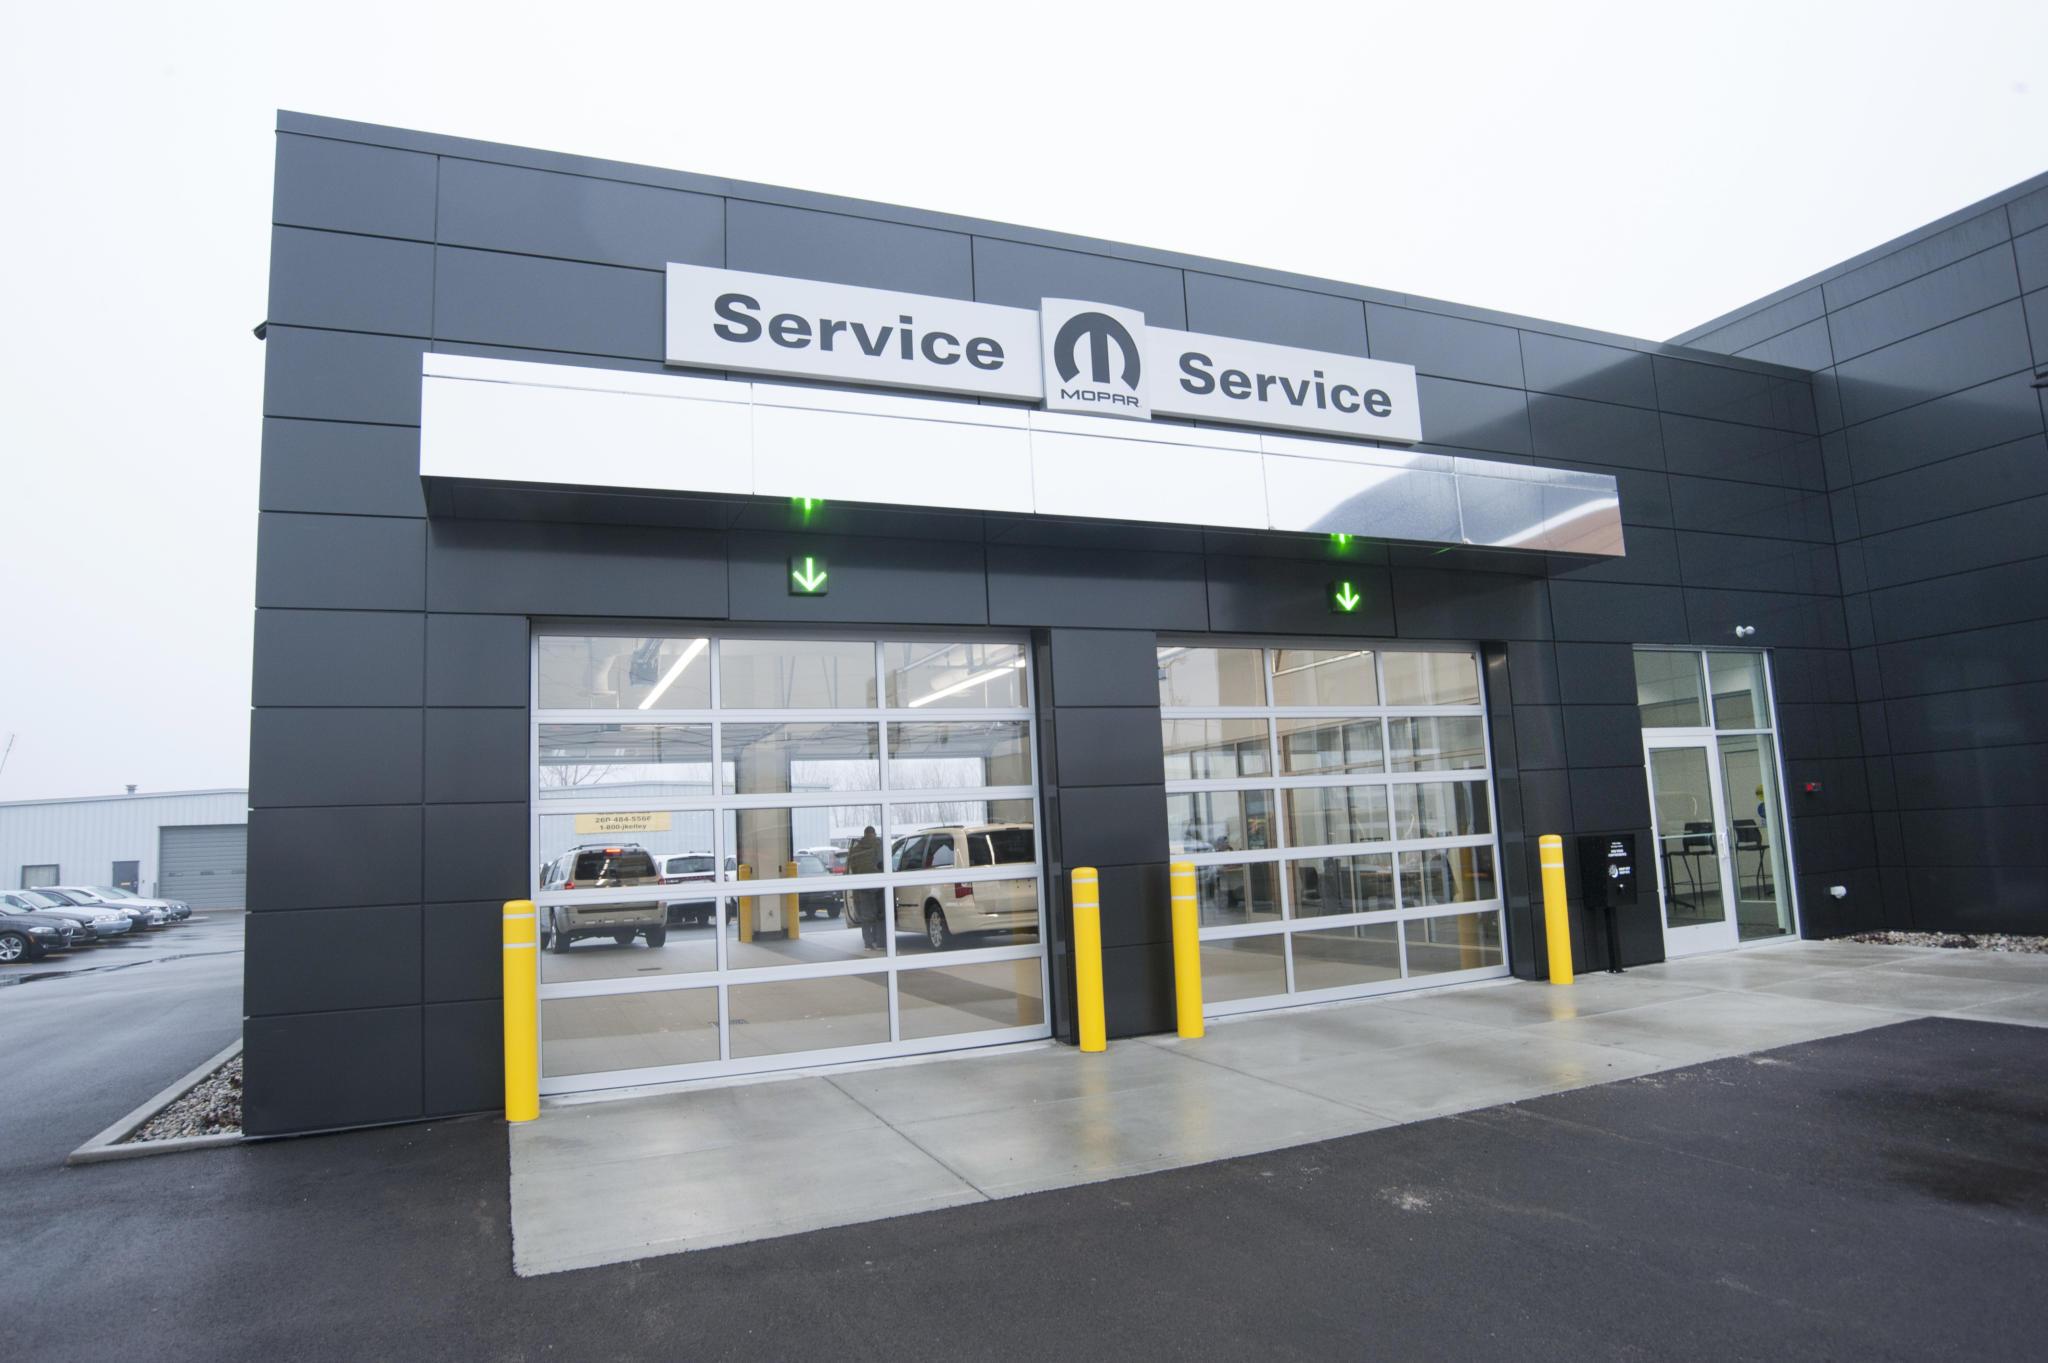 image of entrance to car service garage